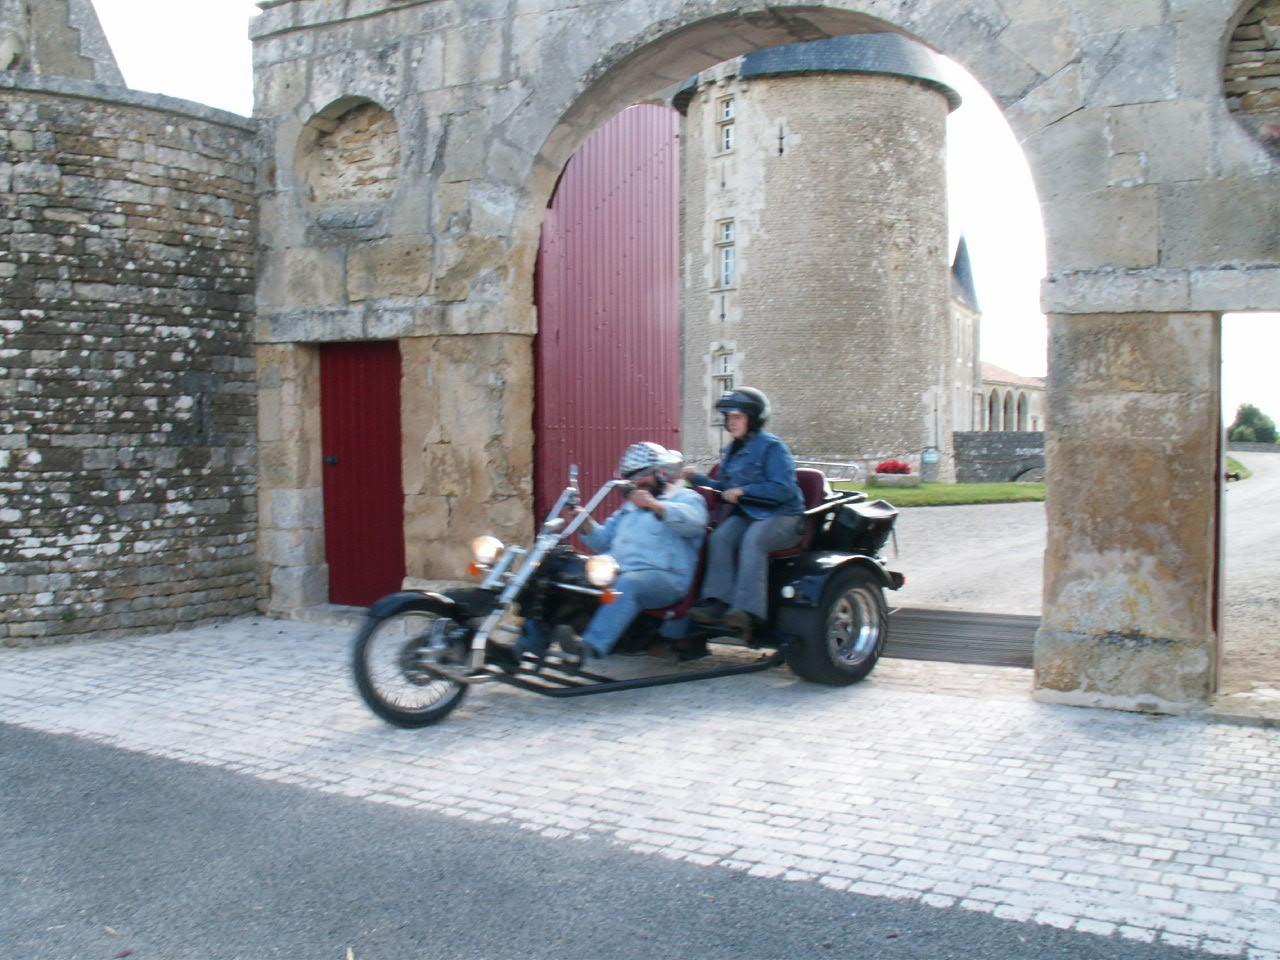 1/18 - Rallye Motos Harley-Davidson - Château de Saveilles ©photo-propriétaire